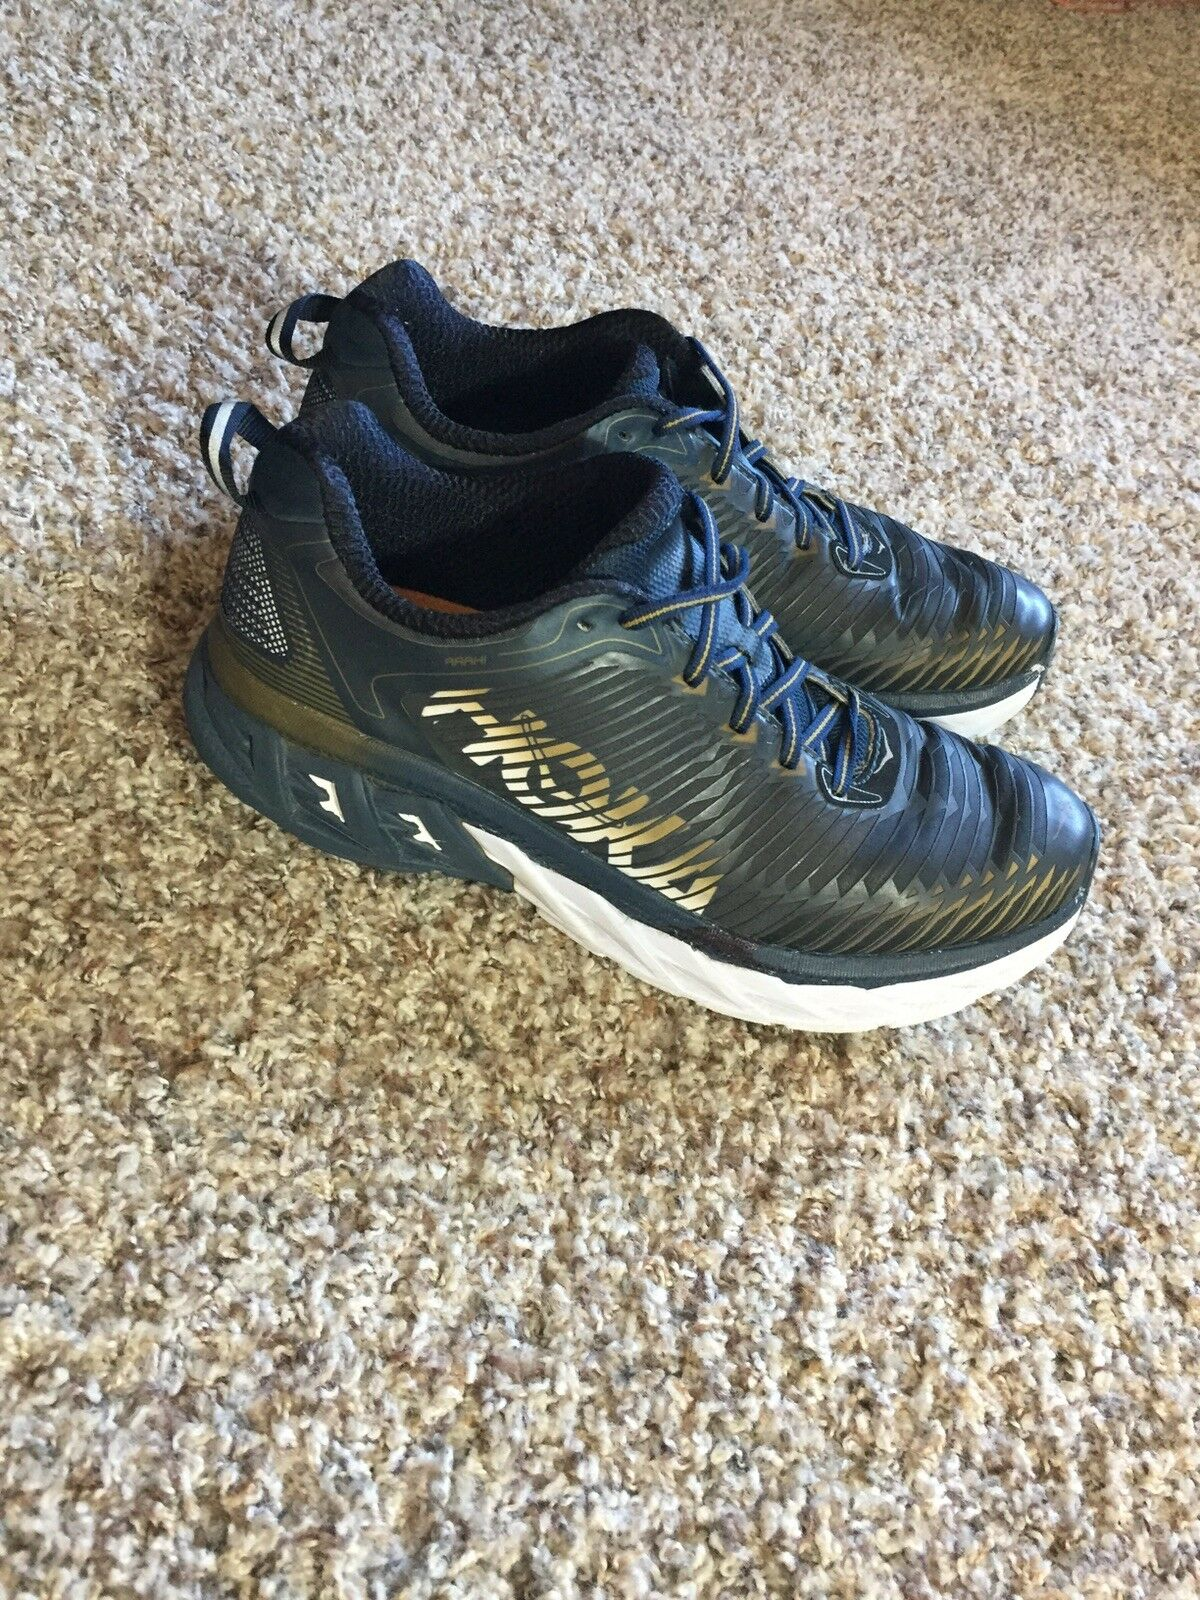 Hoka One One hommes 's noir Running Chaussures 8.5M